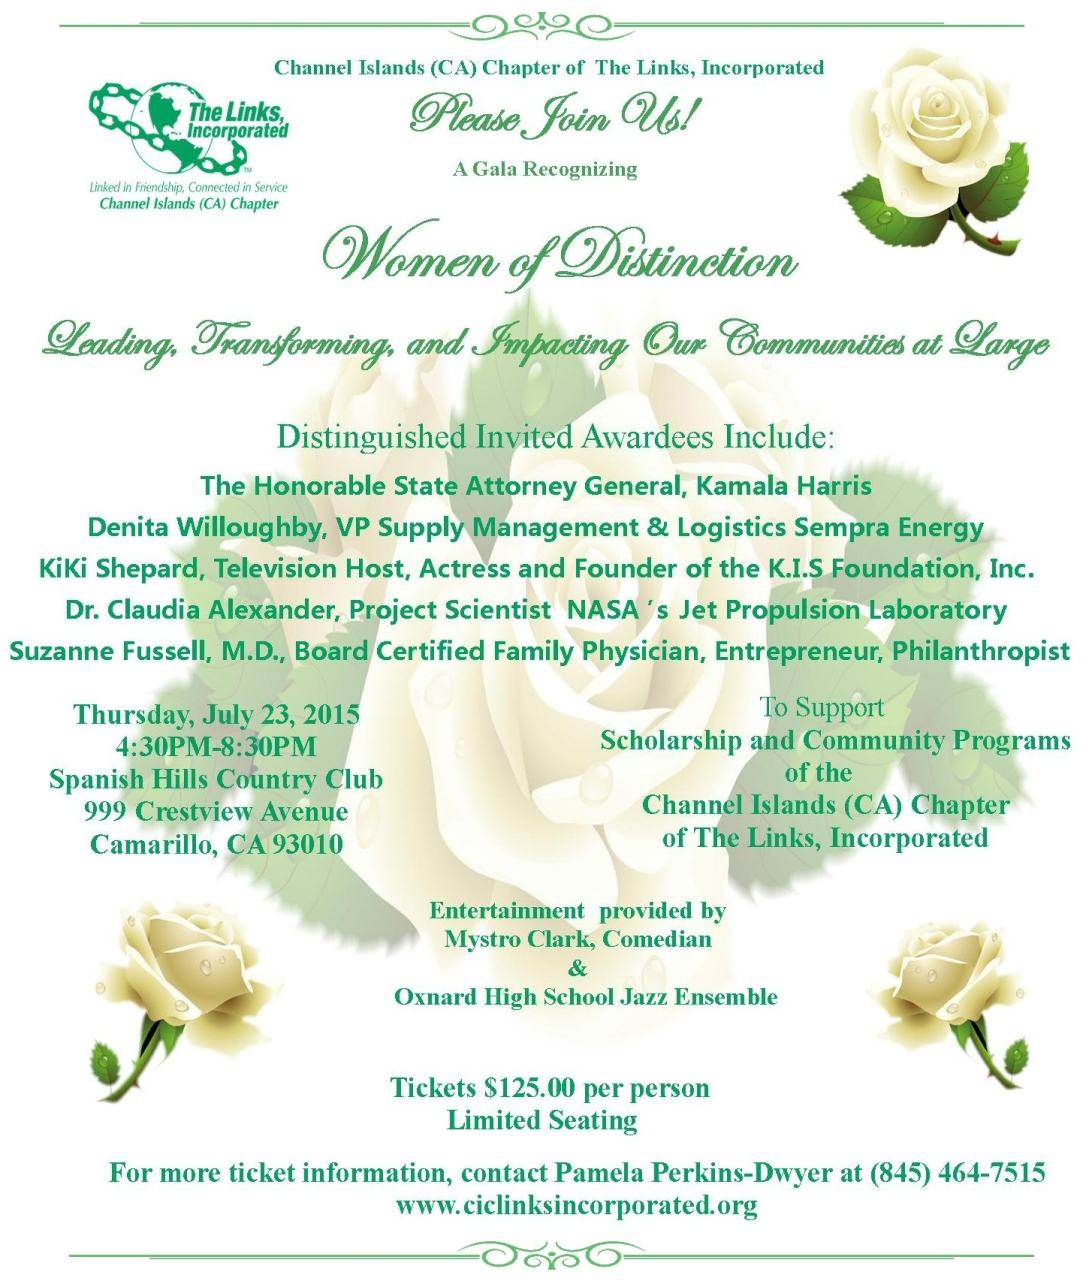 2015 Women of Distinction Invitation